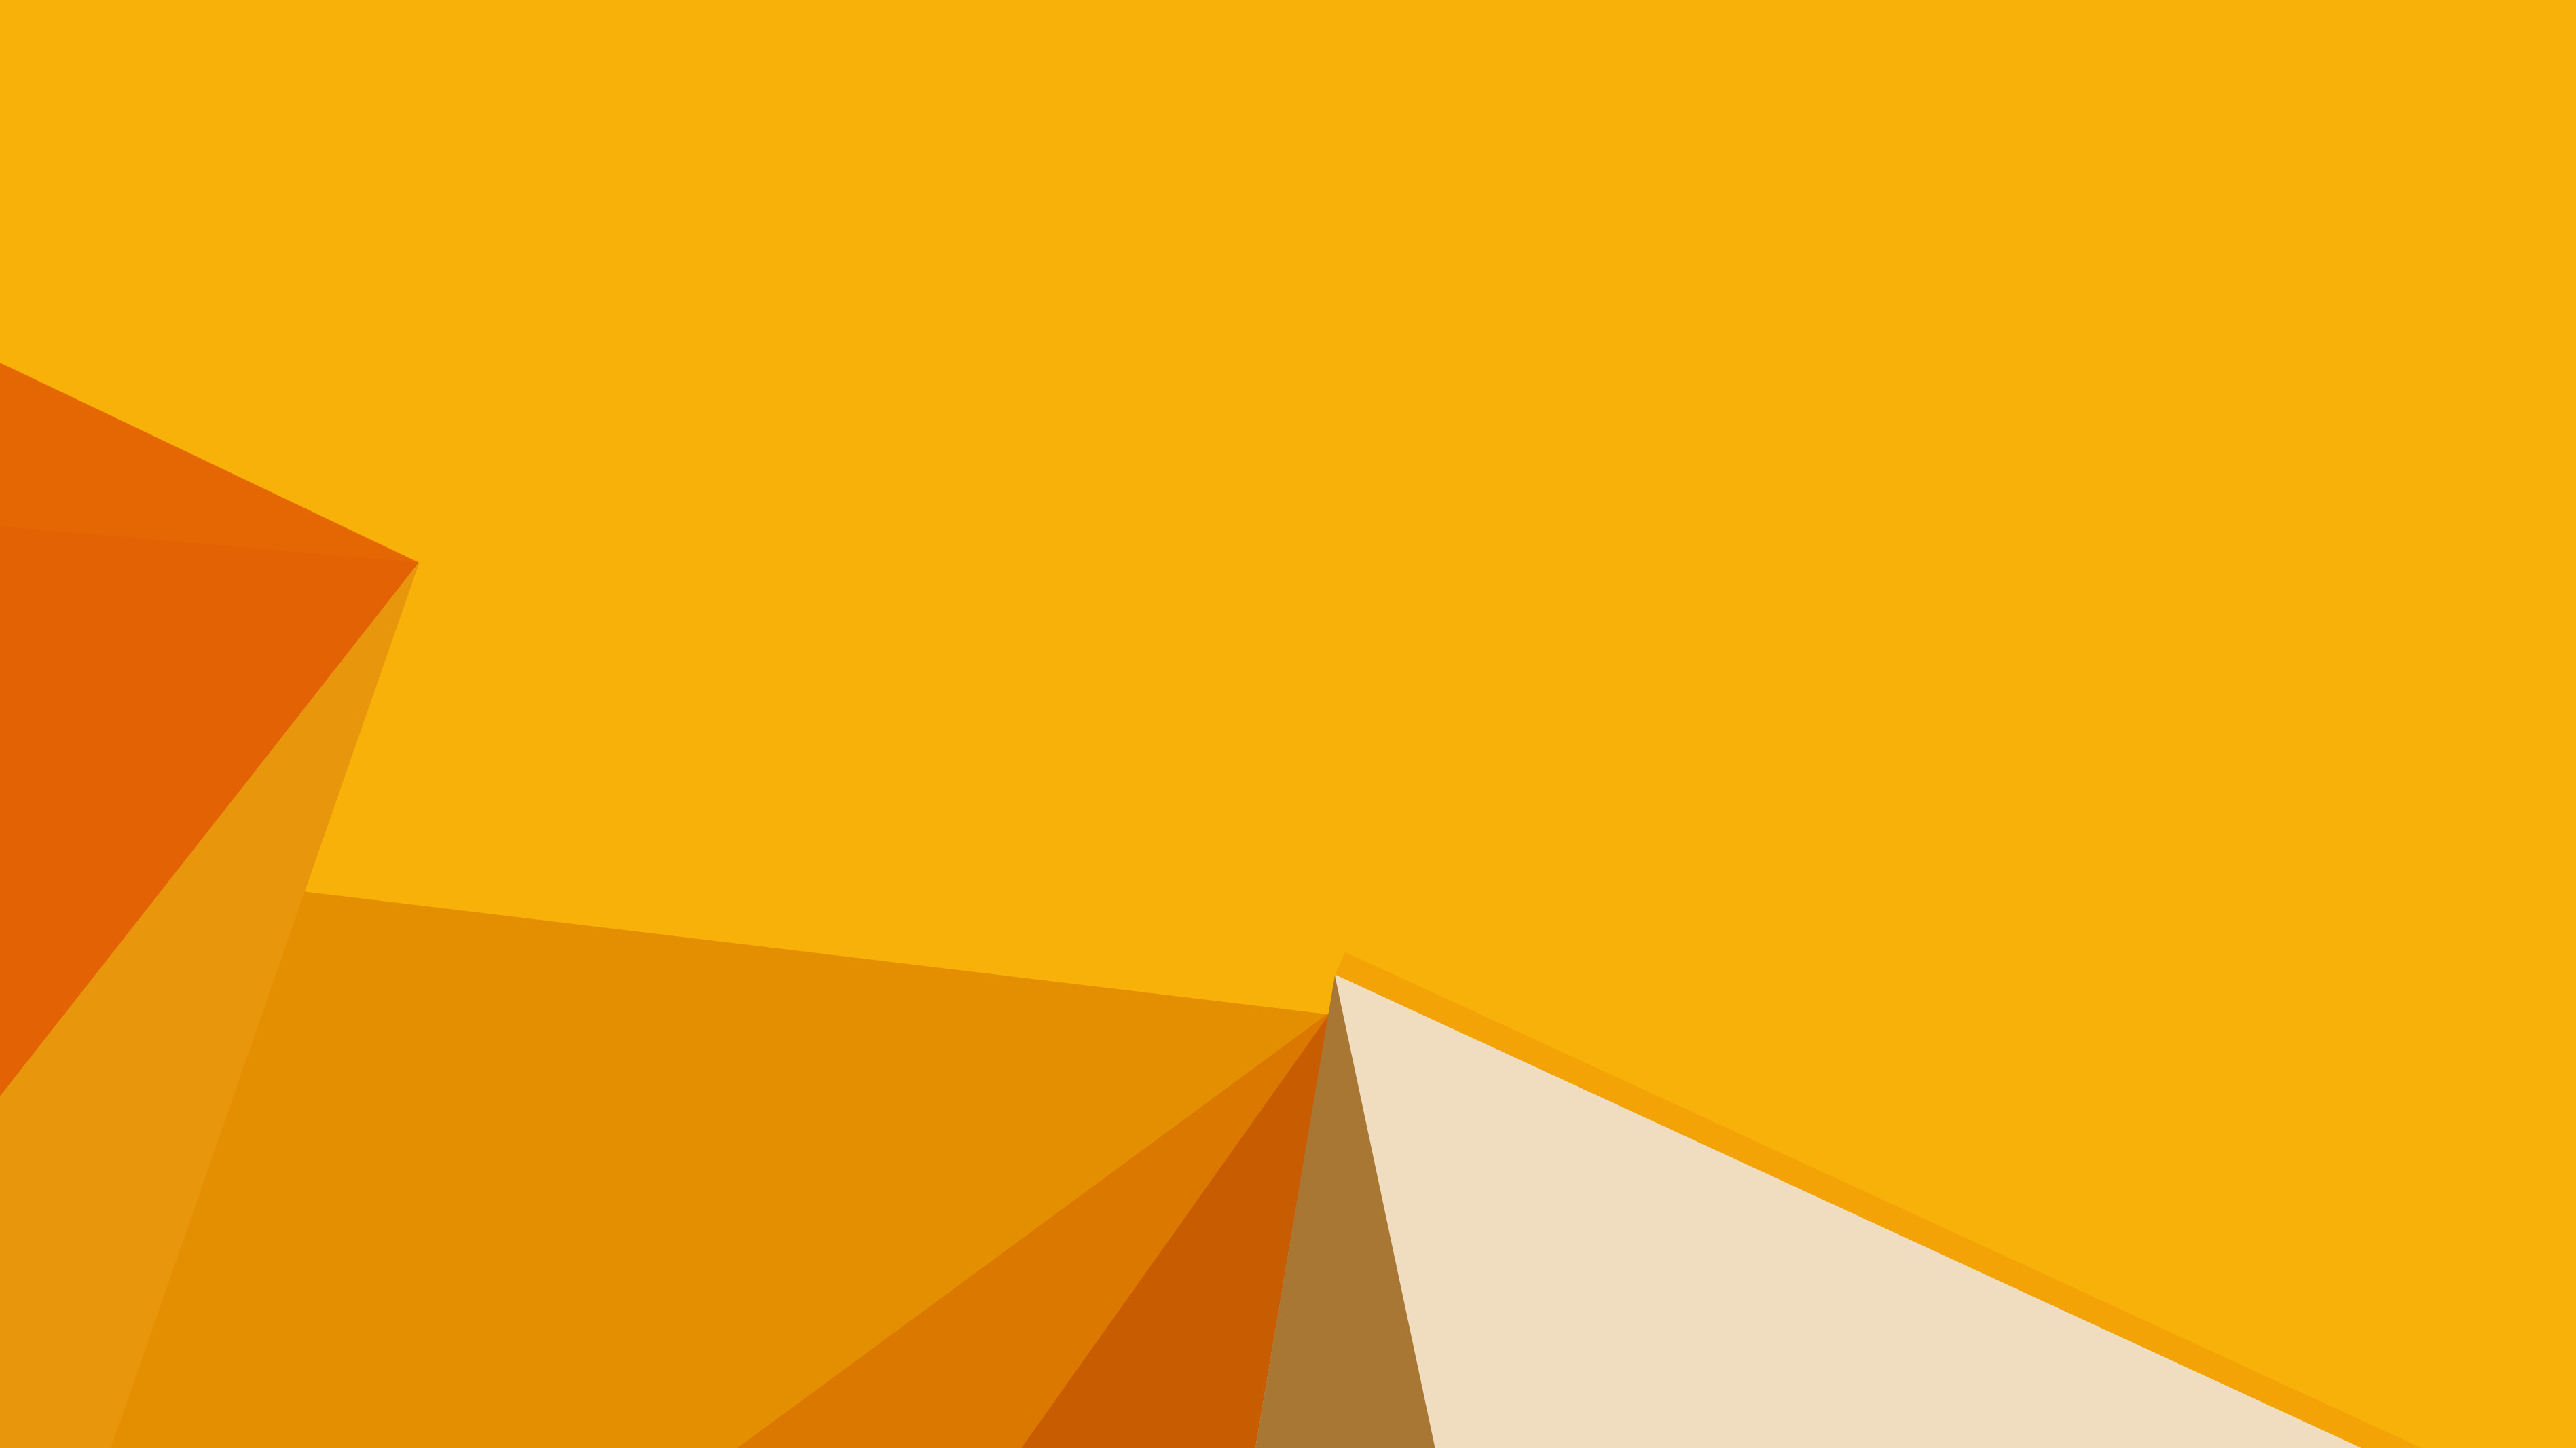 HD Laptop Backgrounds 4K Wallpaper –  https://wallatar.com/wp-content/uploads/2015/02/hd_laptop_backgrounds_4k_wallpaper.jpg  – https://wallatar.com/hd…